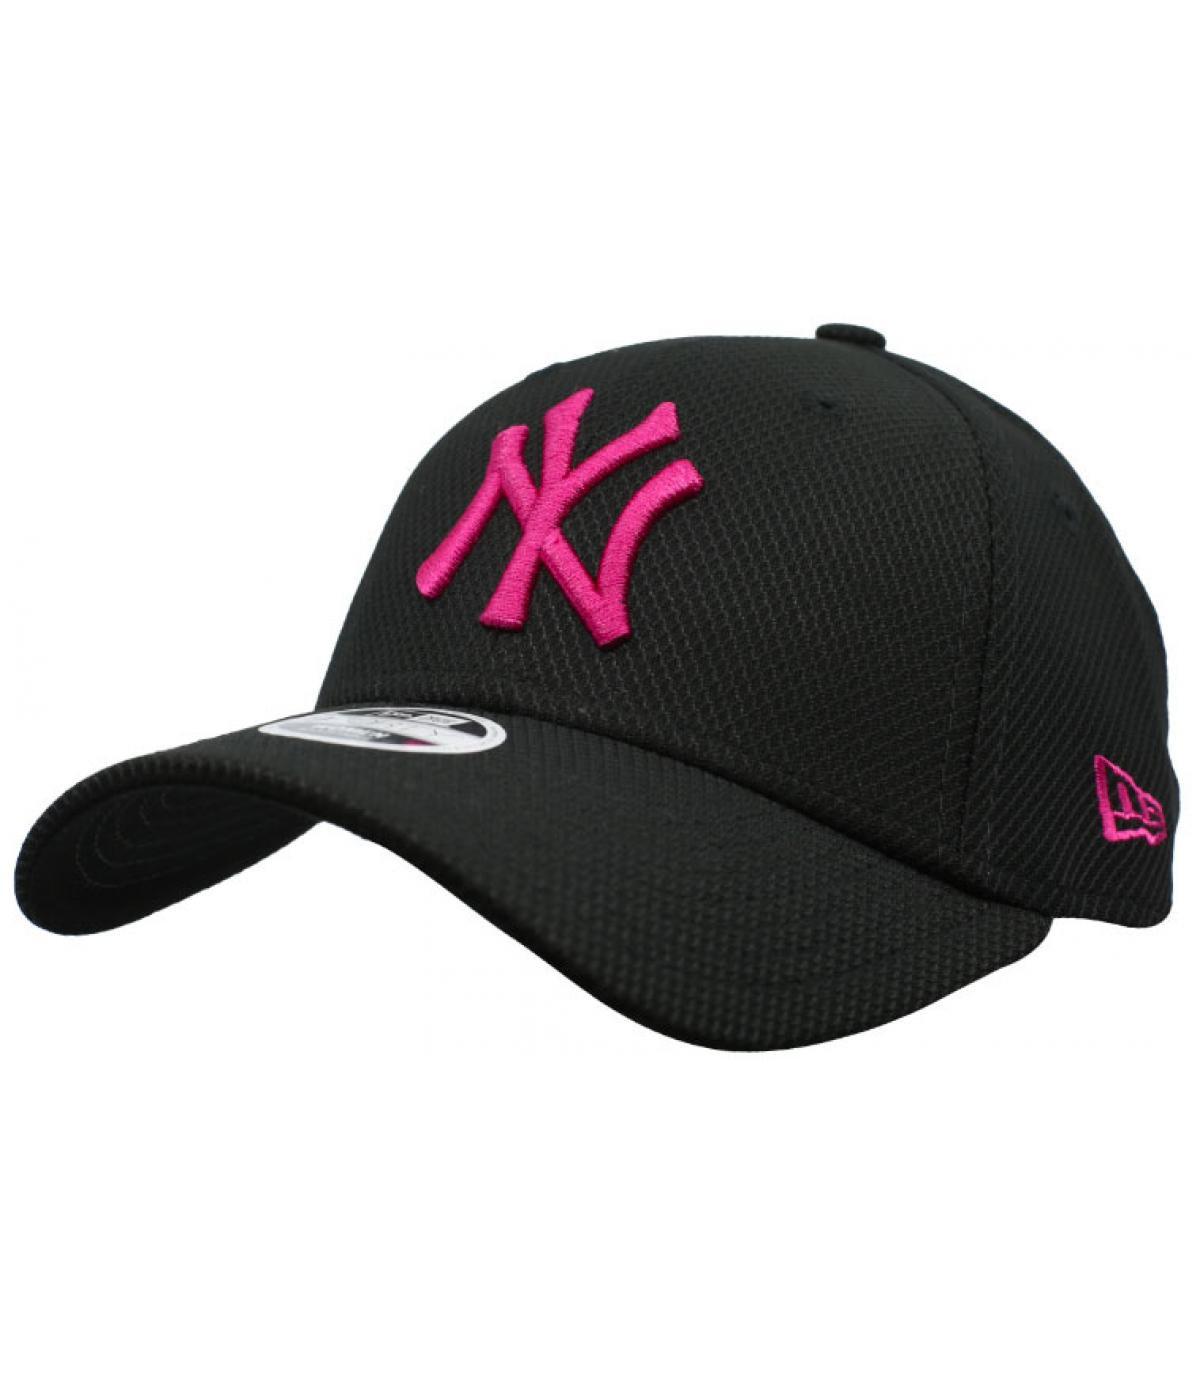 NY cap vrouw zwart roze